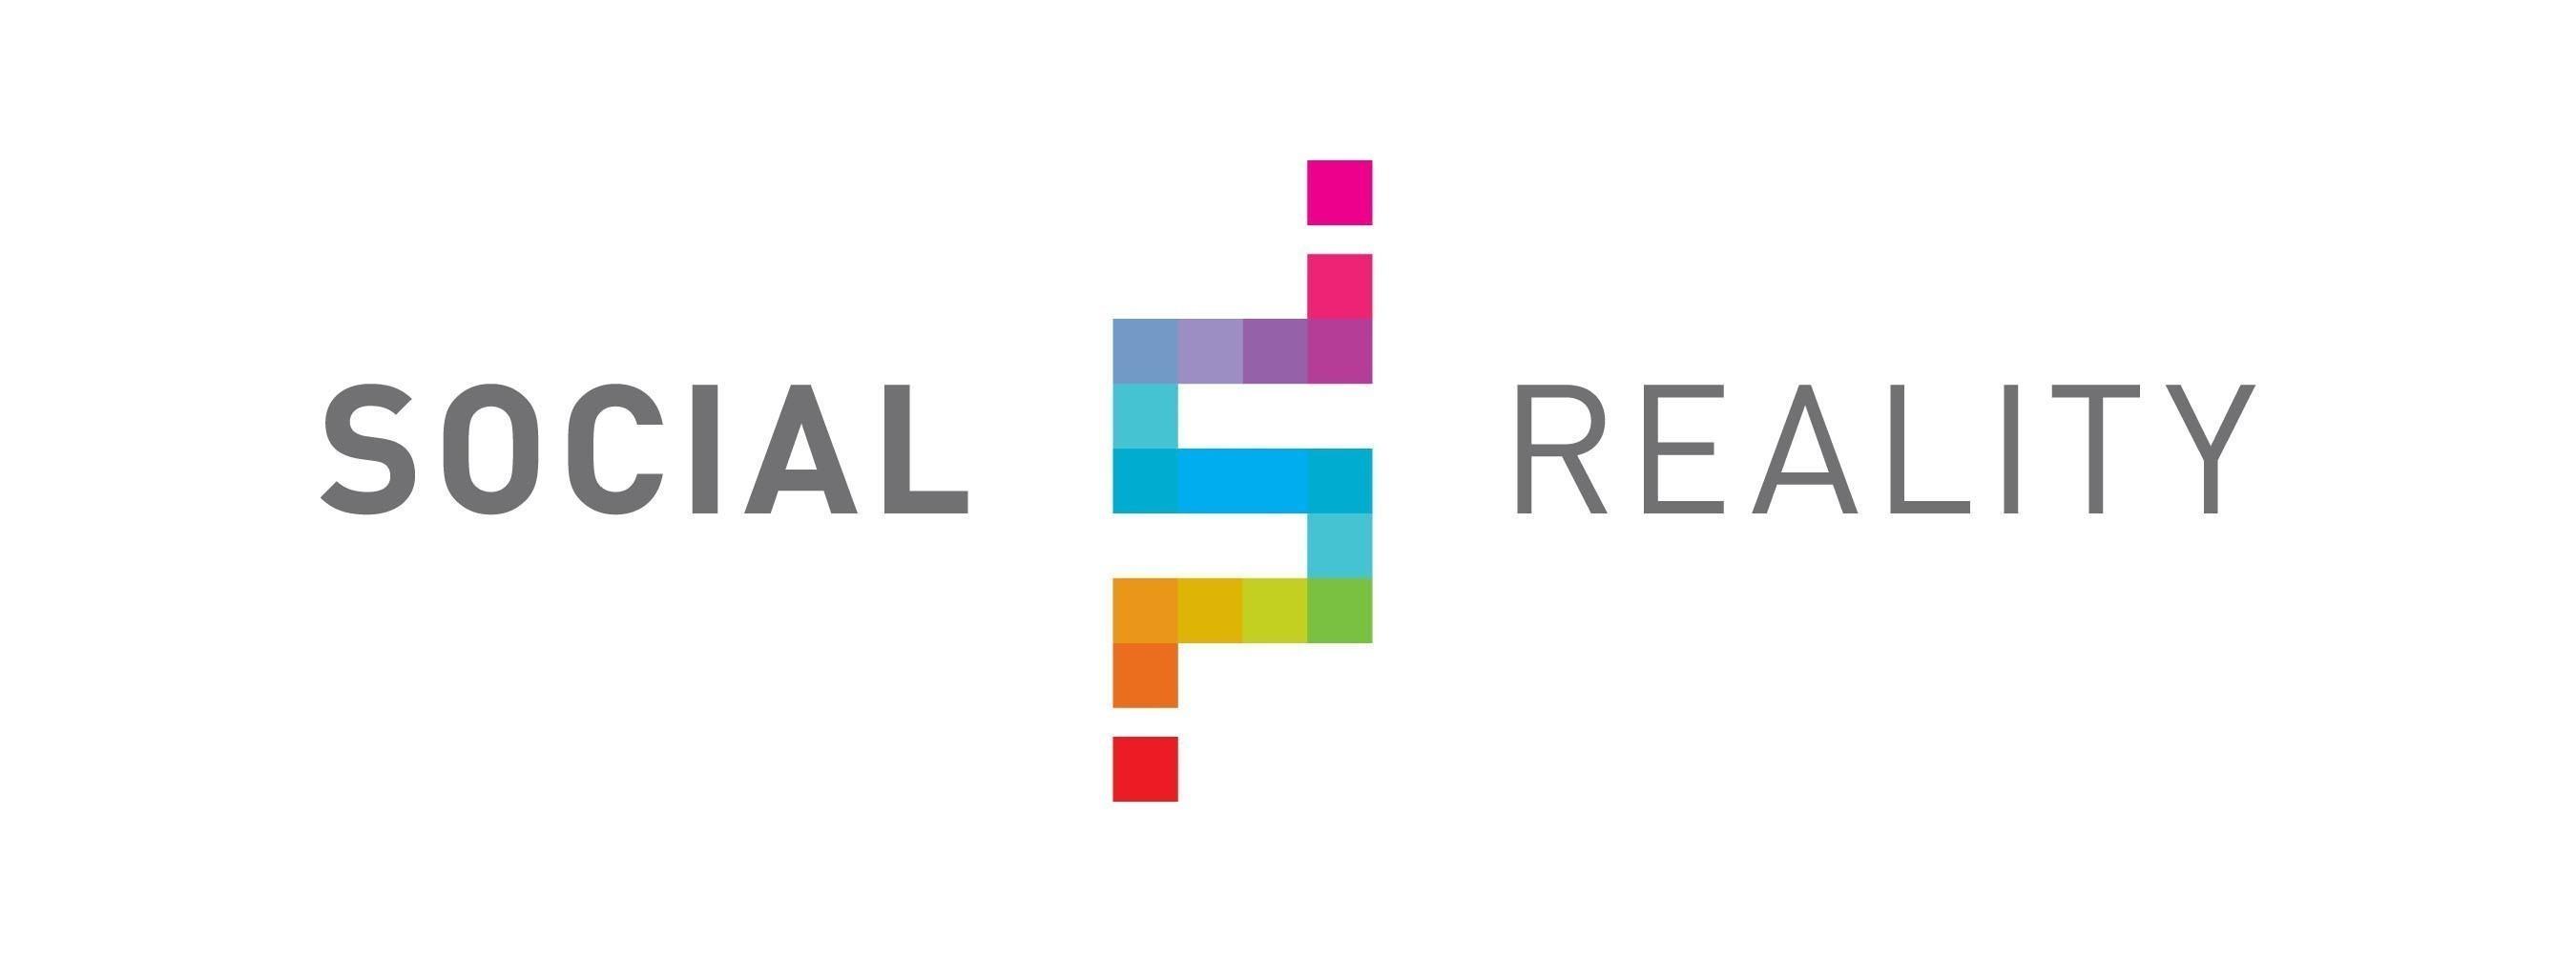 Social Reality Inc.   www.socialreality.com